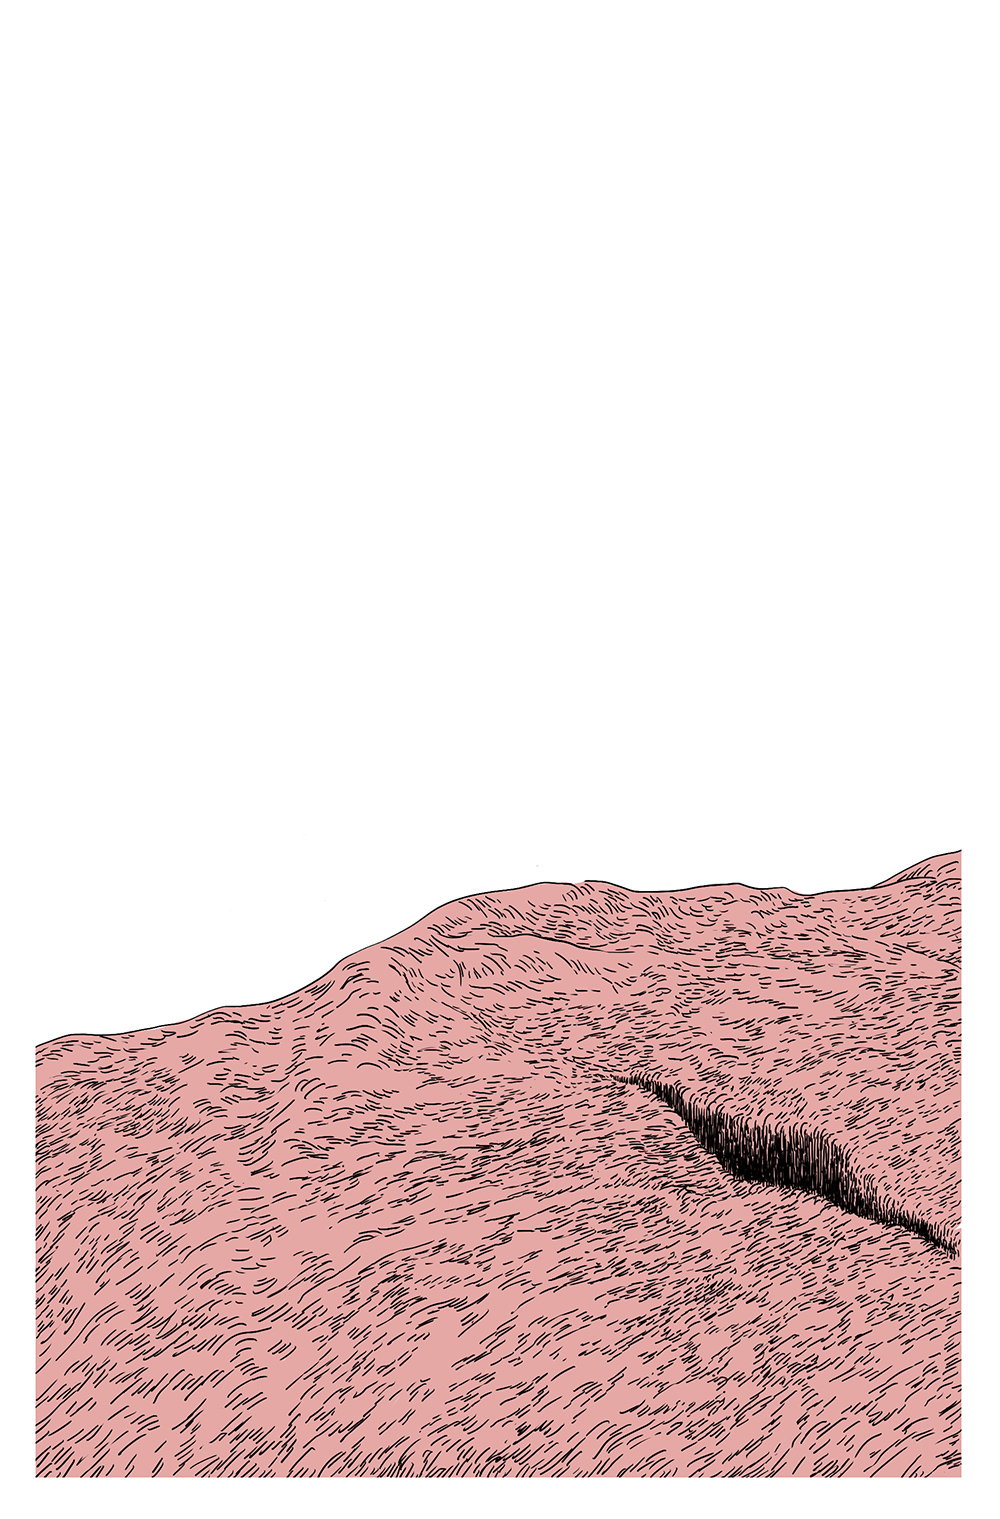 meathead8.jpg